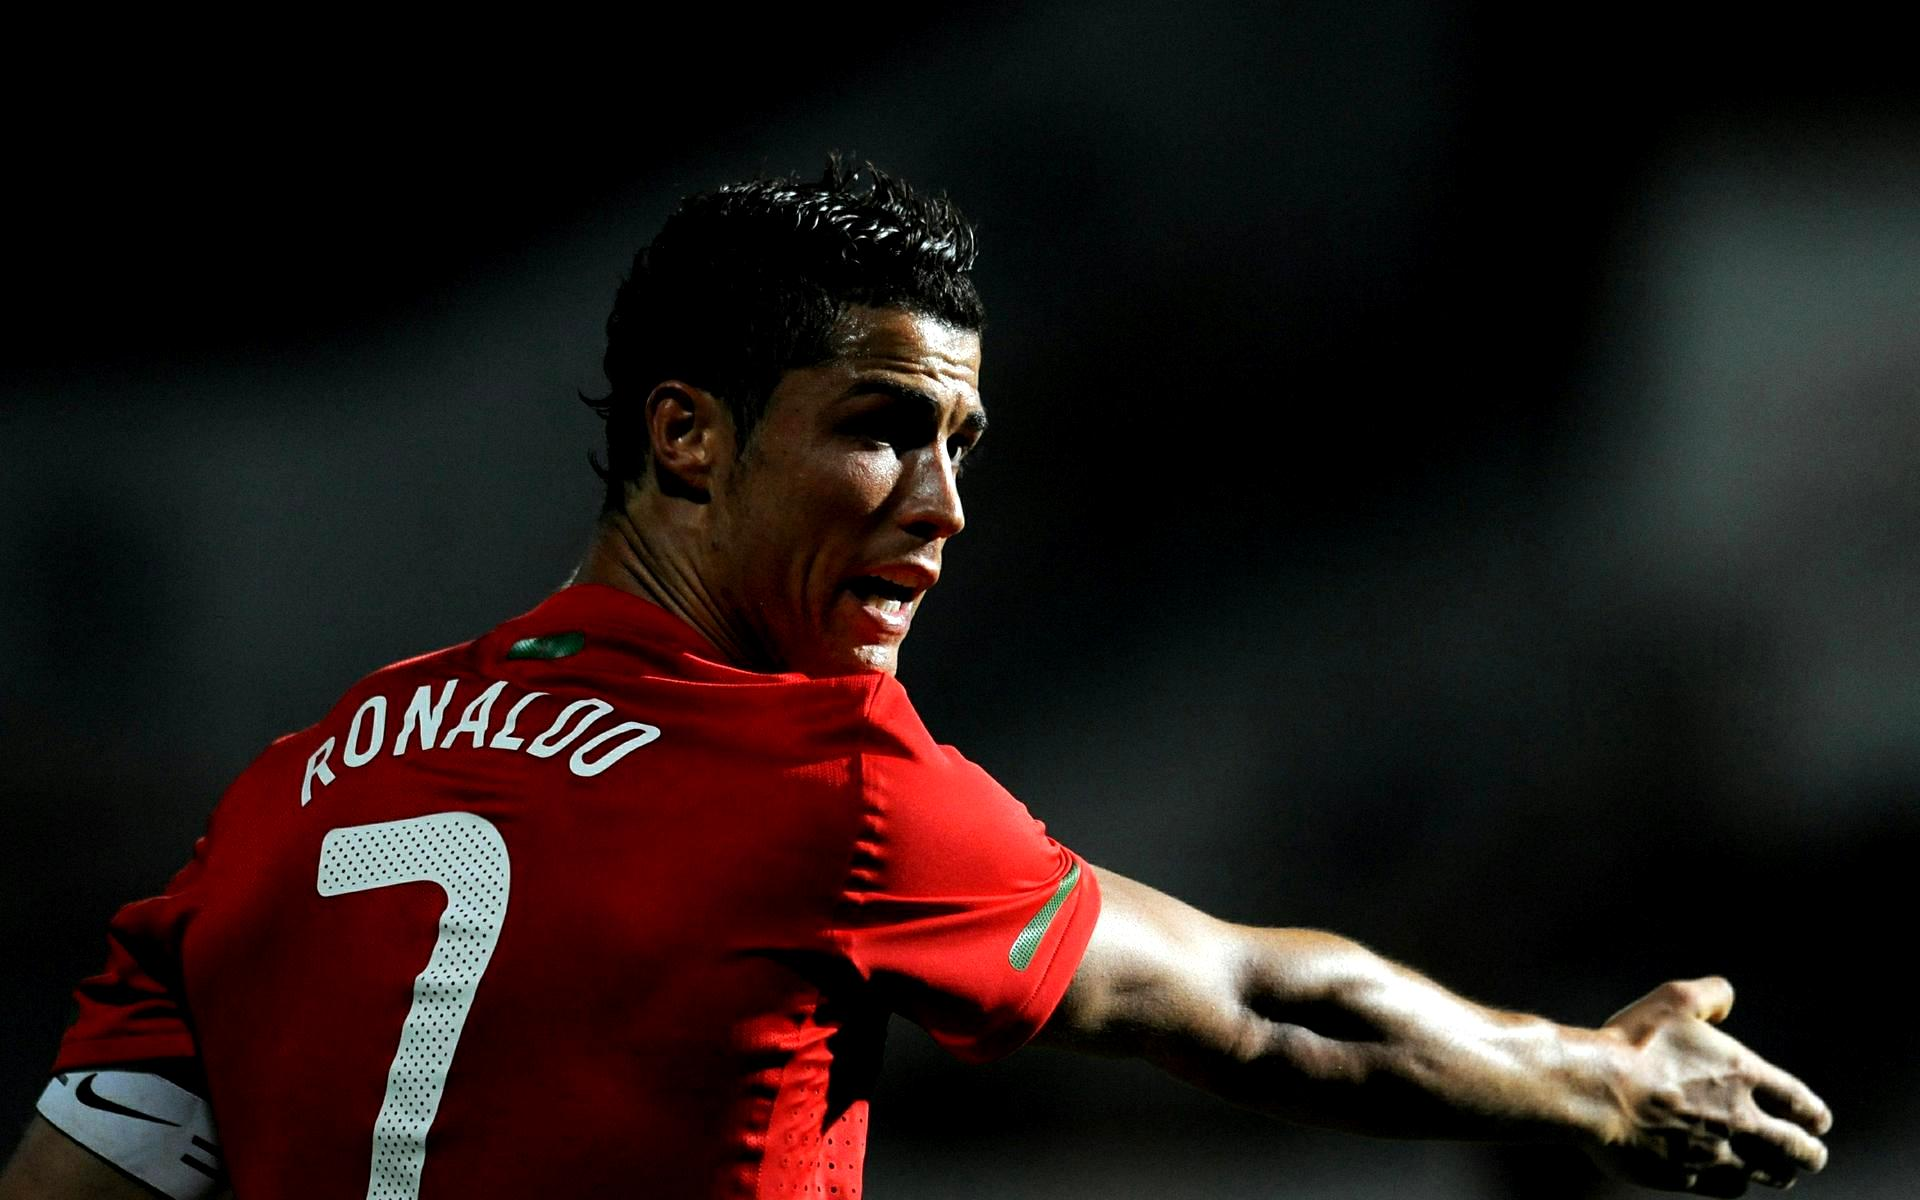 CR7 Ronaldo HD Wallpapers   Football HD Wallpapers 1920x1200